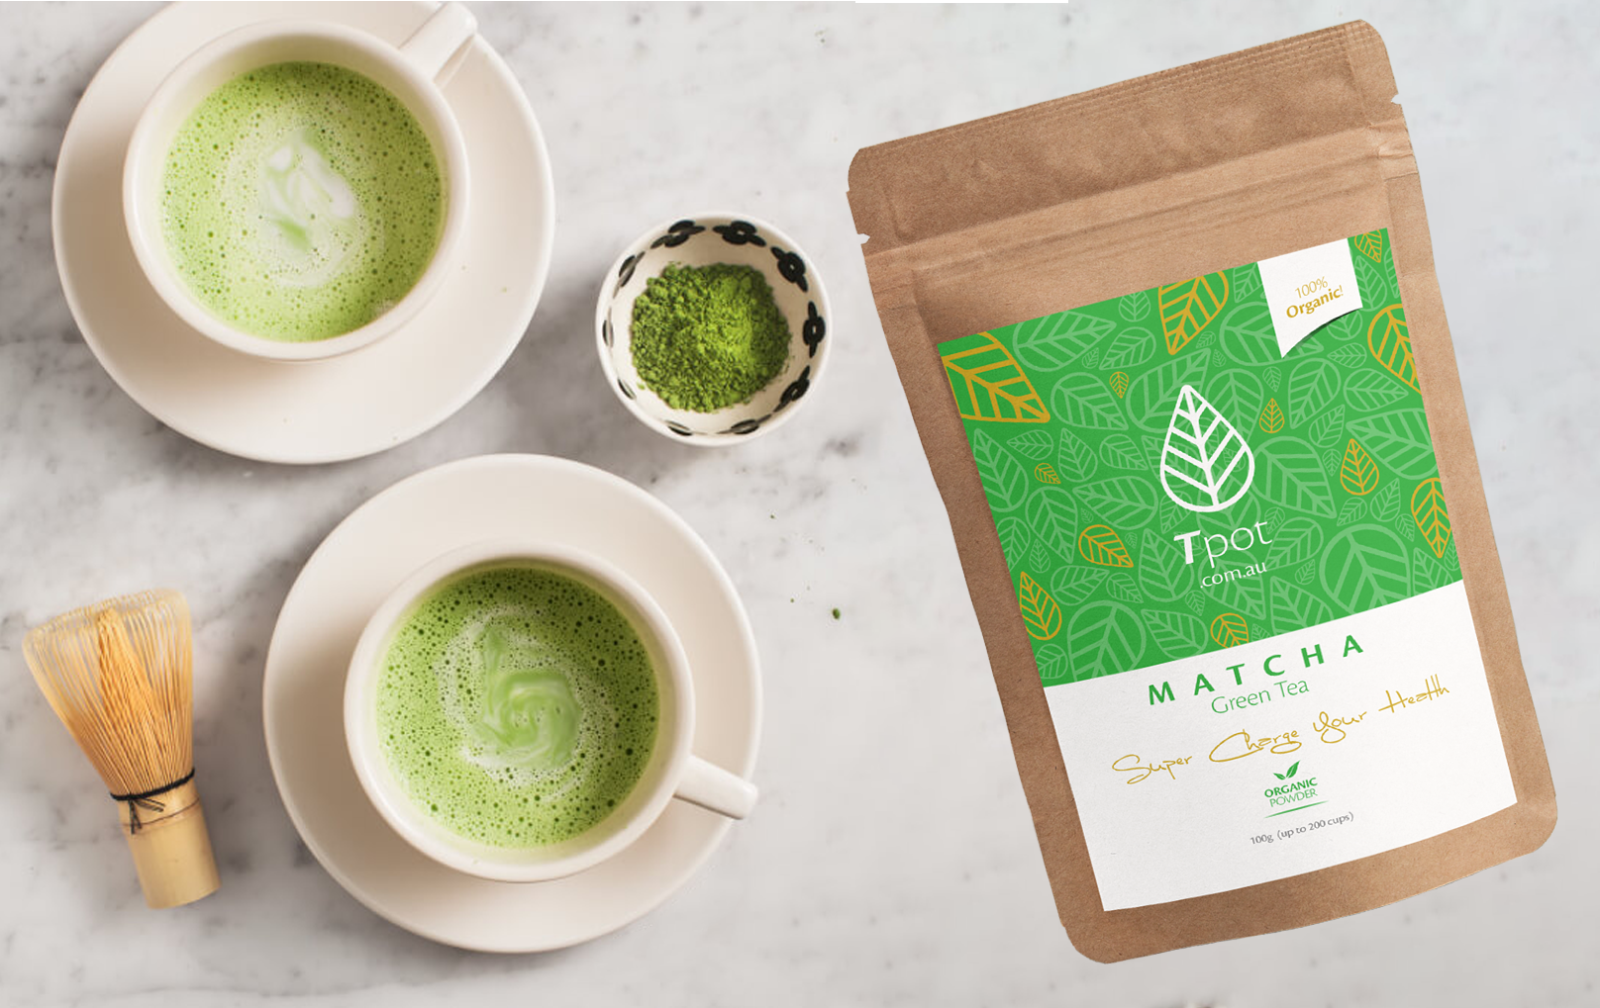 ORGANIC Japanese Matcha Green Tea Powder - Latte - Up to 200 Serves 5